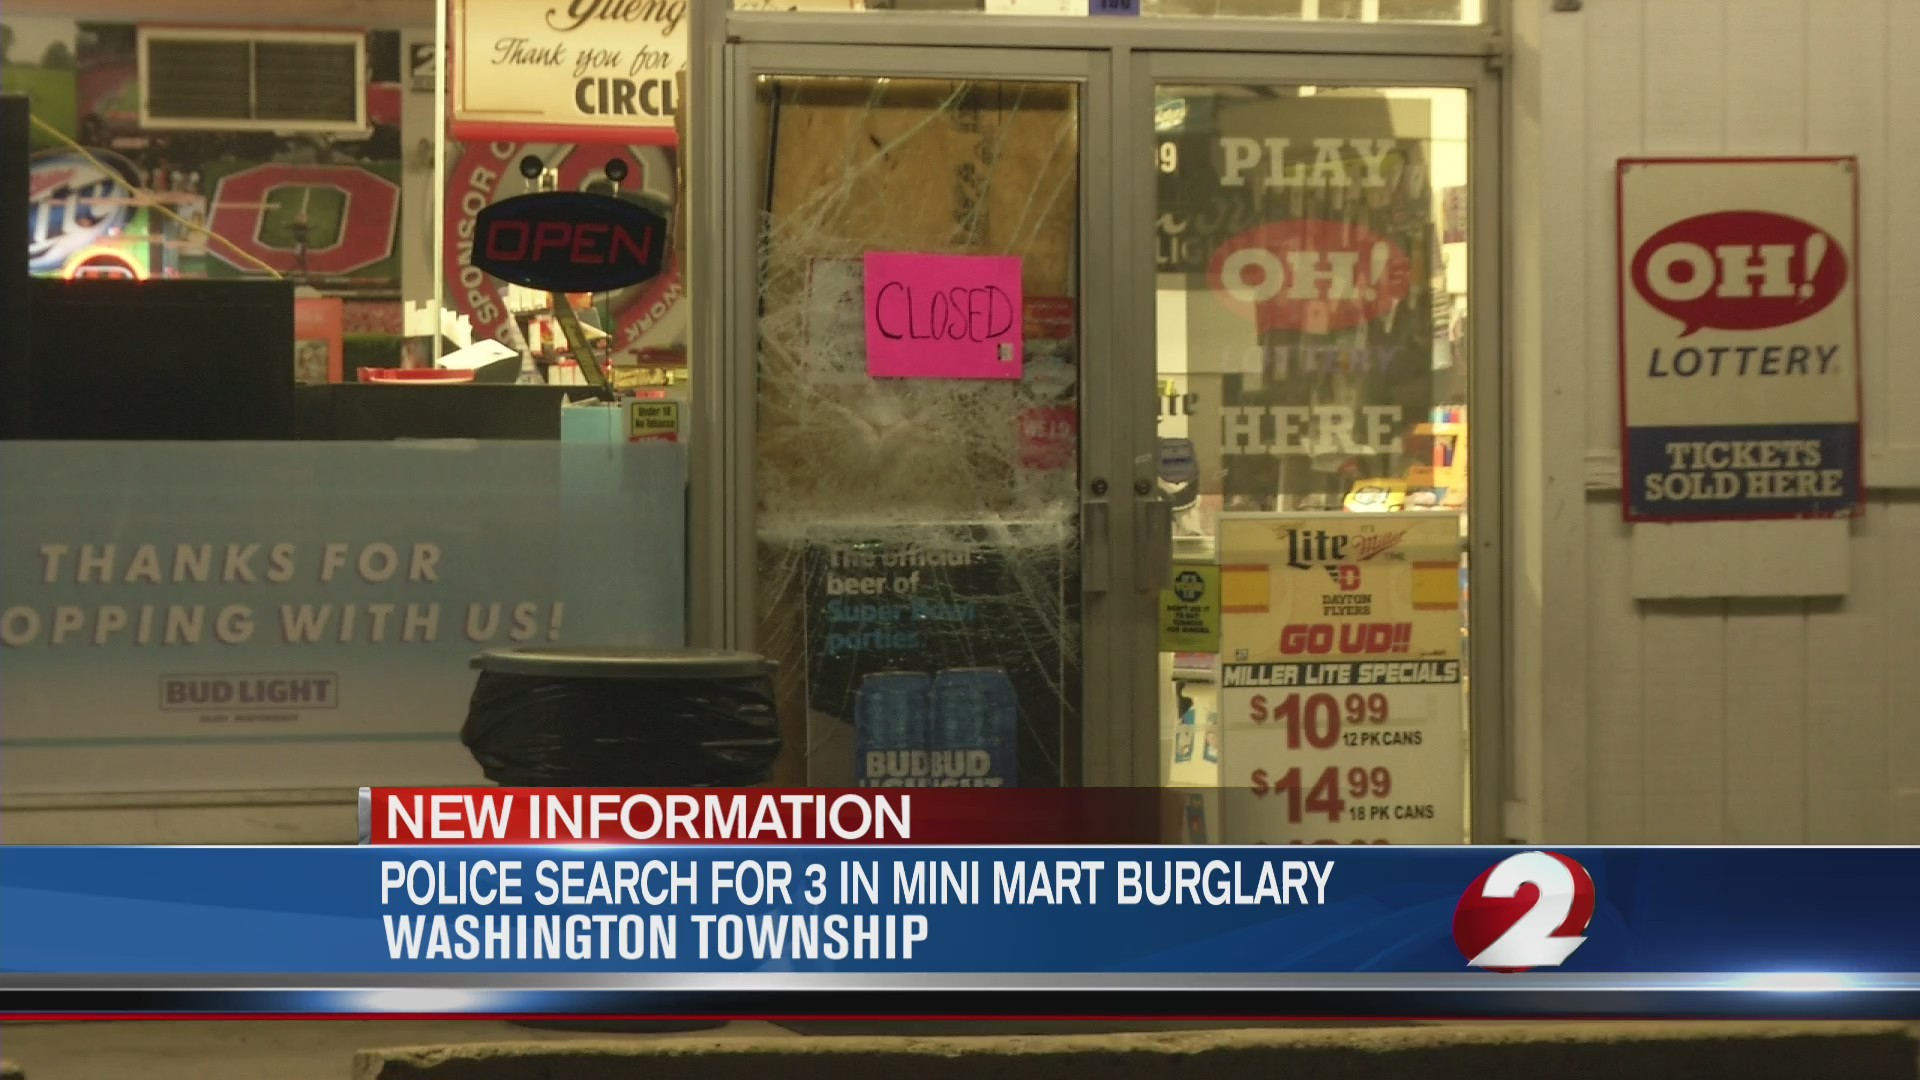 Police search for 3 in Mini Mart burglary